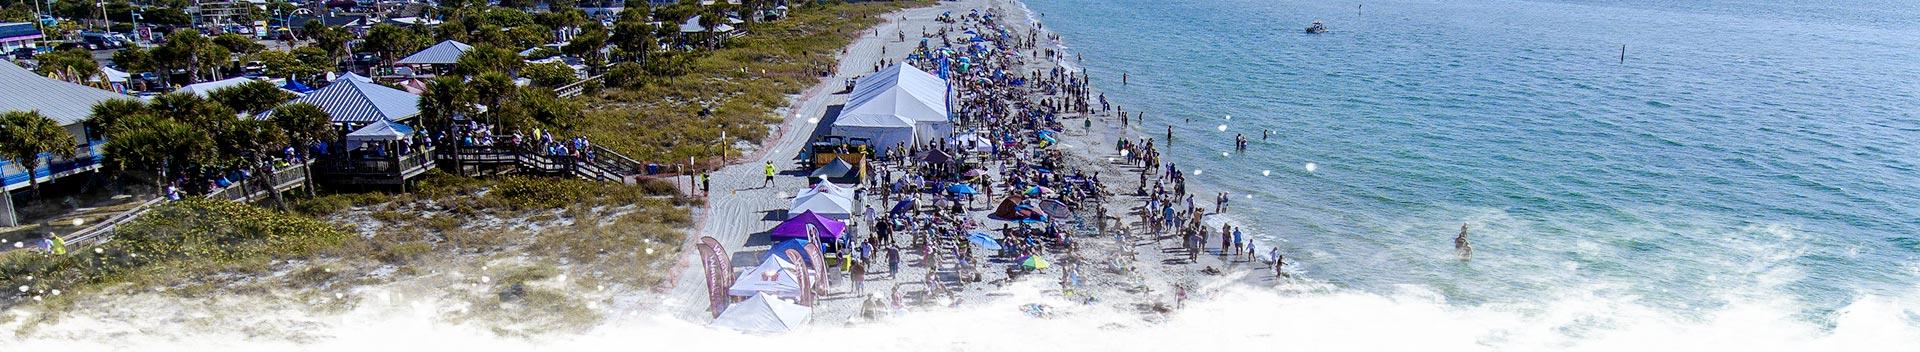 Aerial photo of Englewood Beach Waterfest